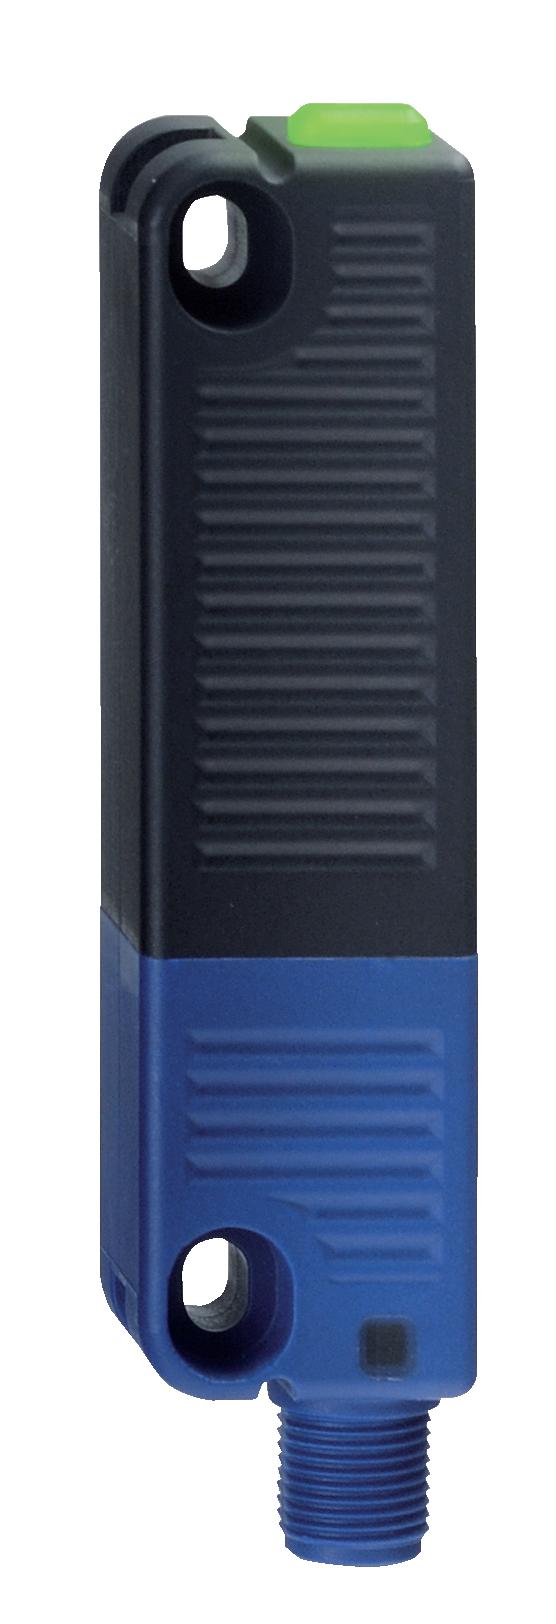 RSS 36 – RFID